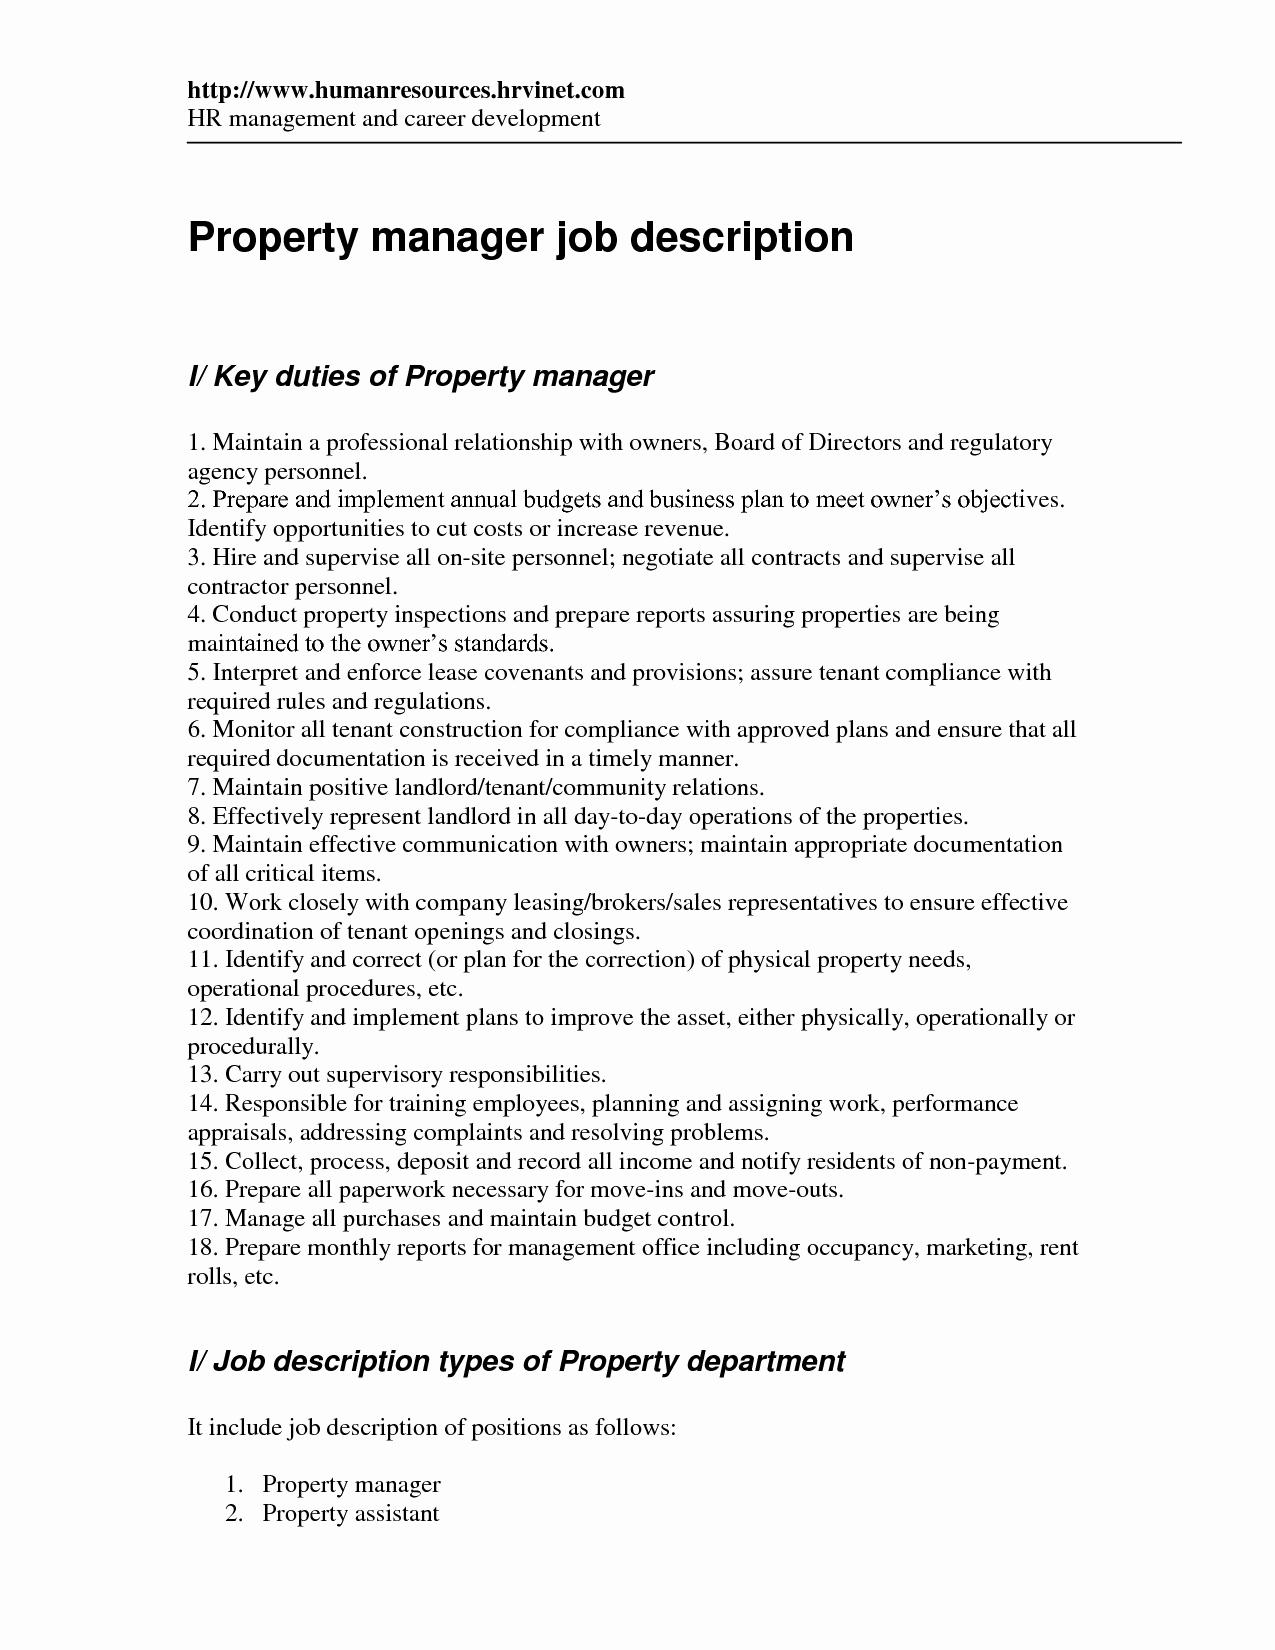 property manager job description samples